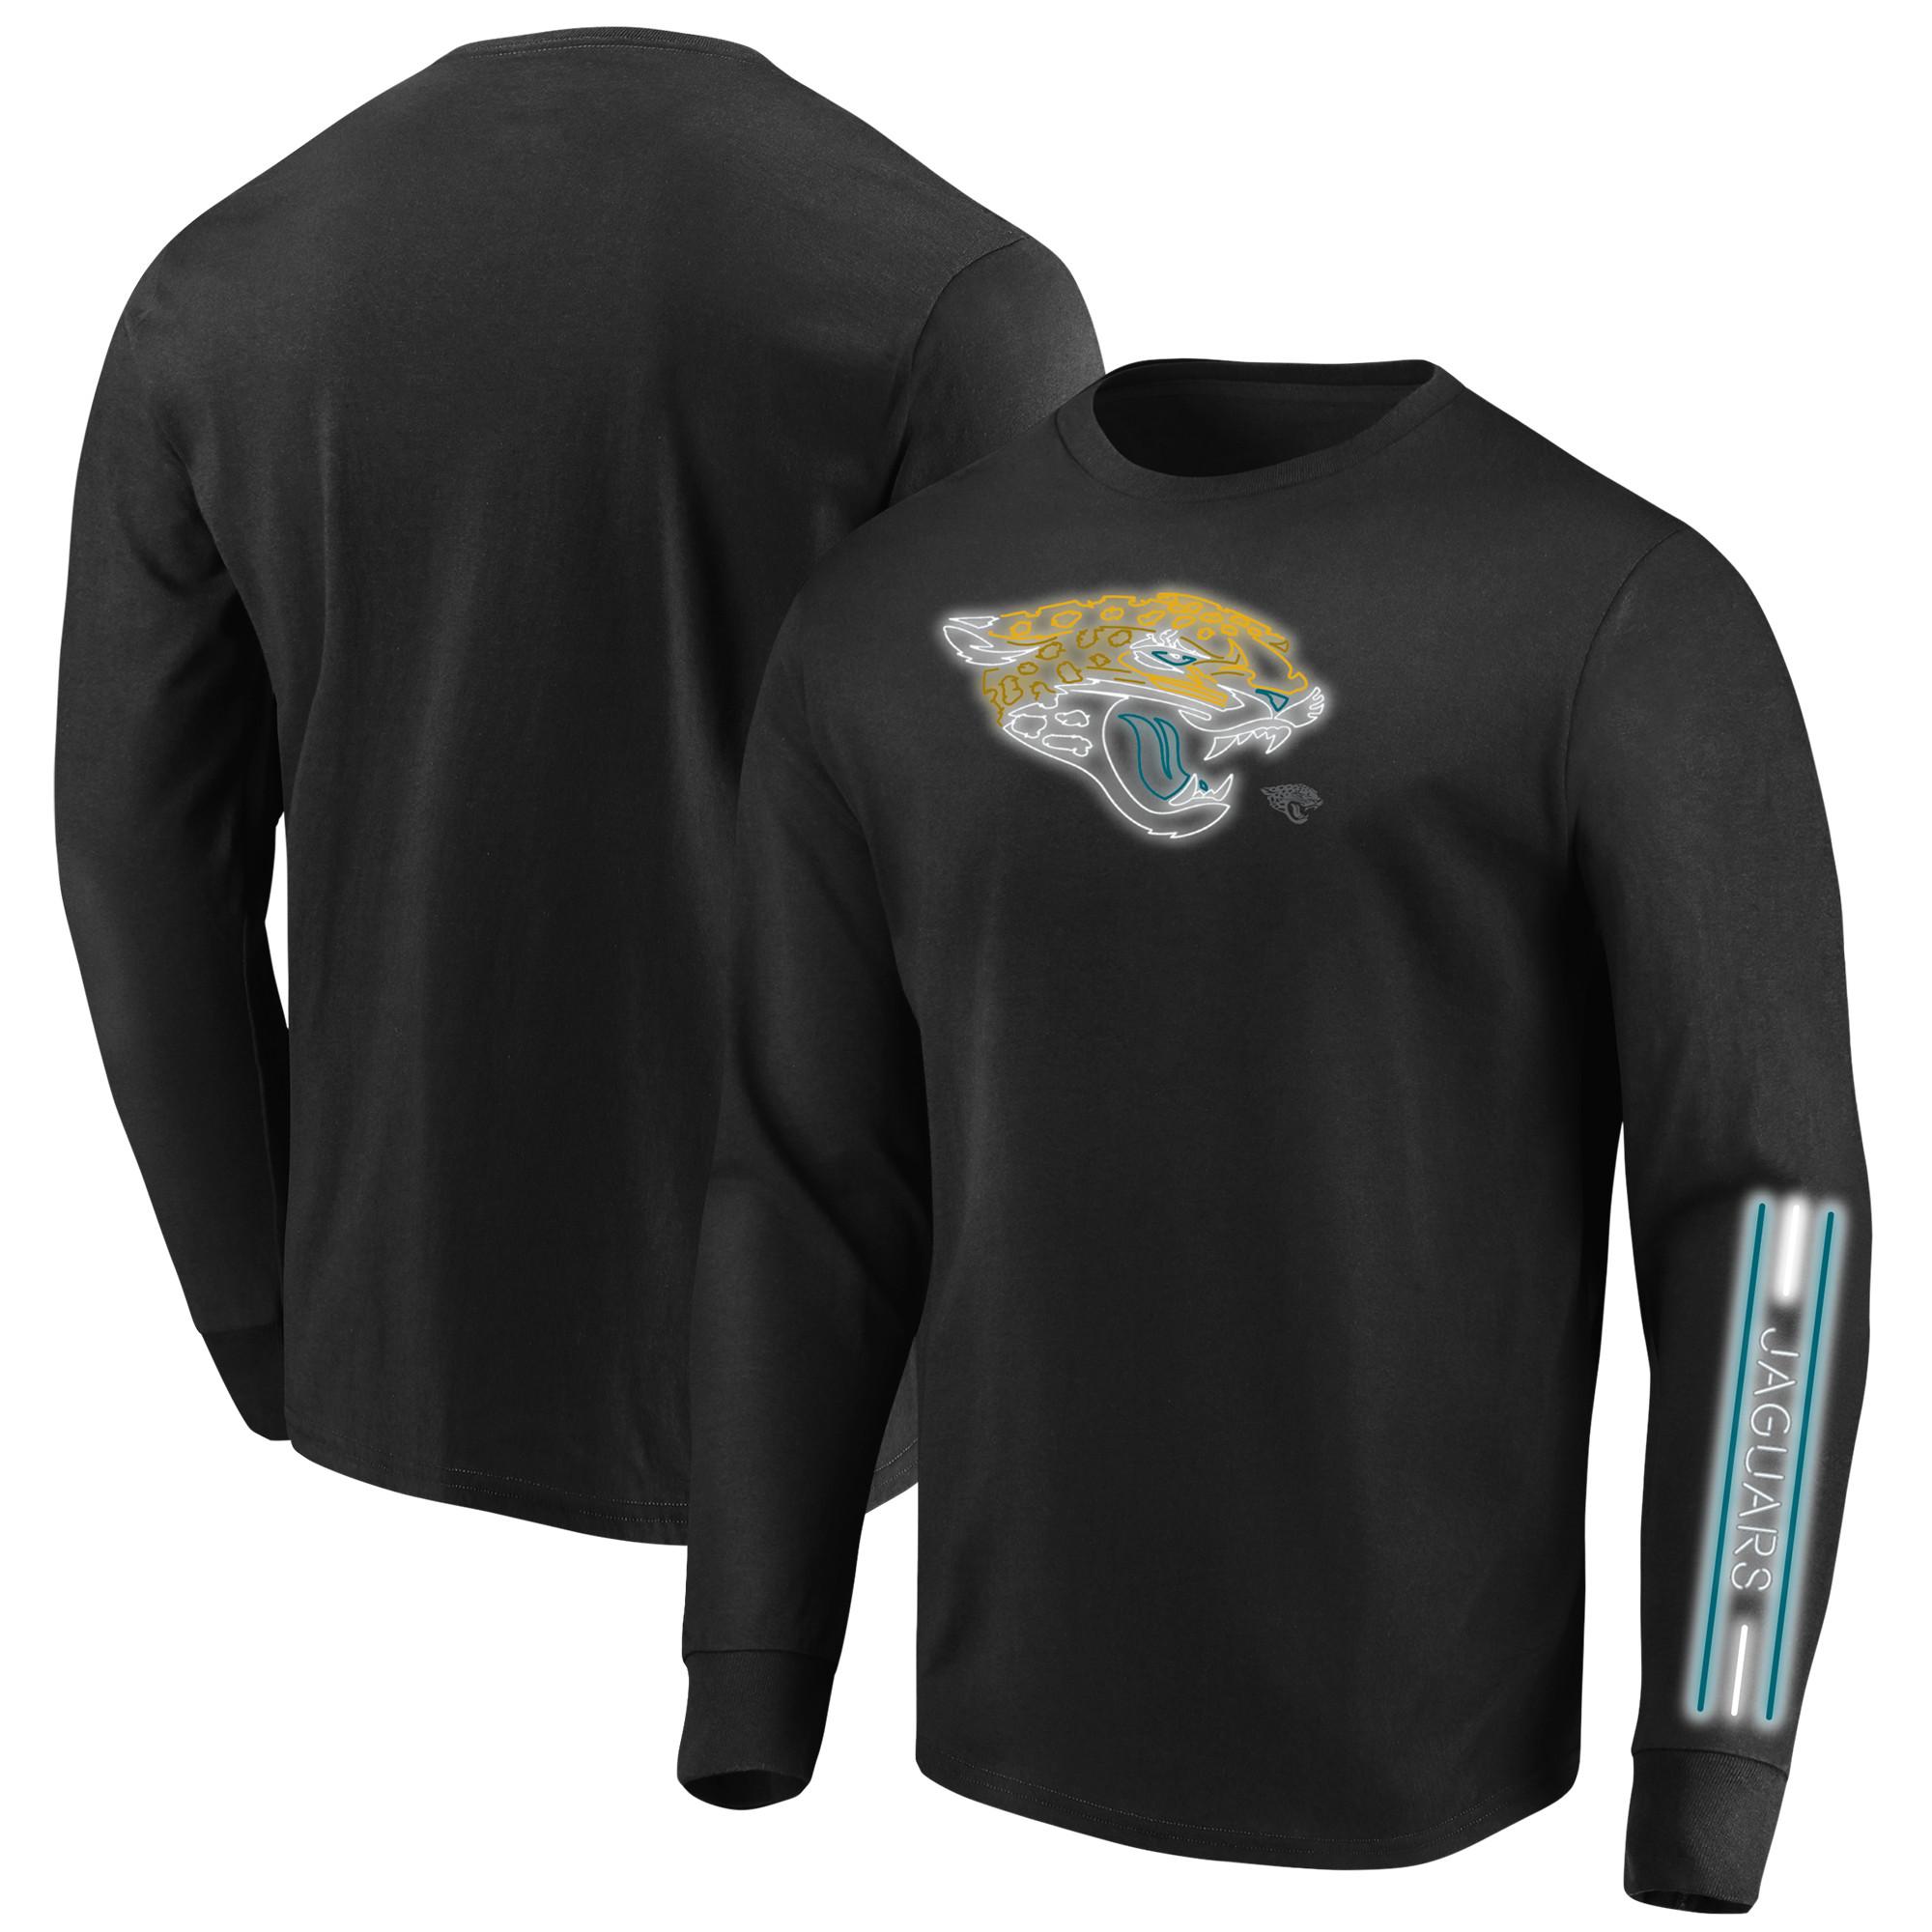 Jacksonville Jaguars Majestic Big & Tall Startling Success Long Sleeve T-Shirt - Black